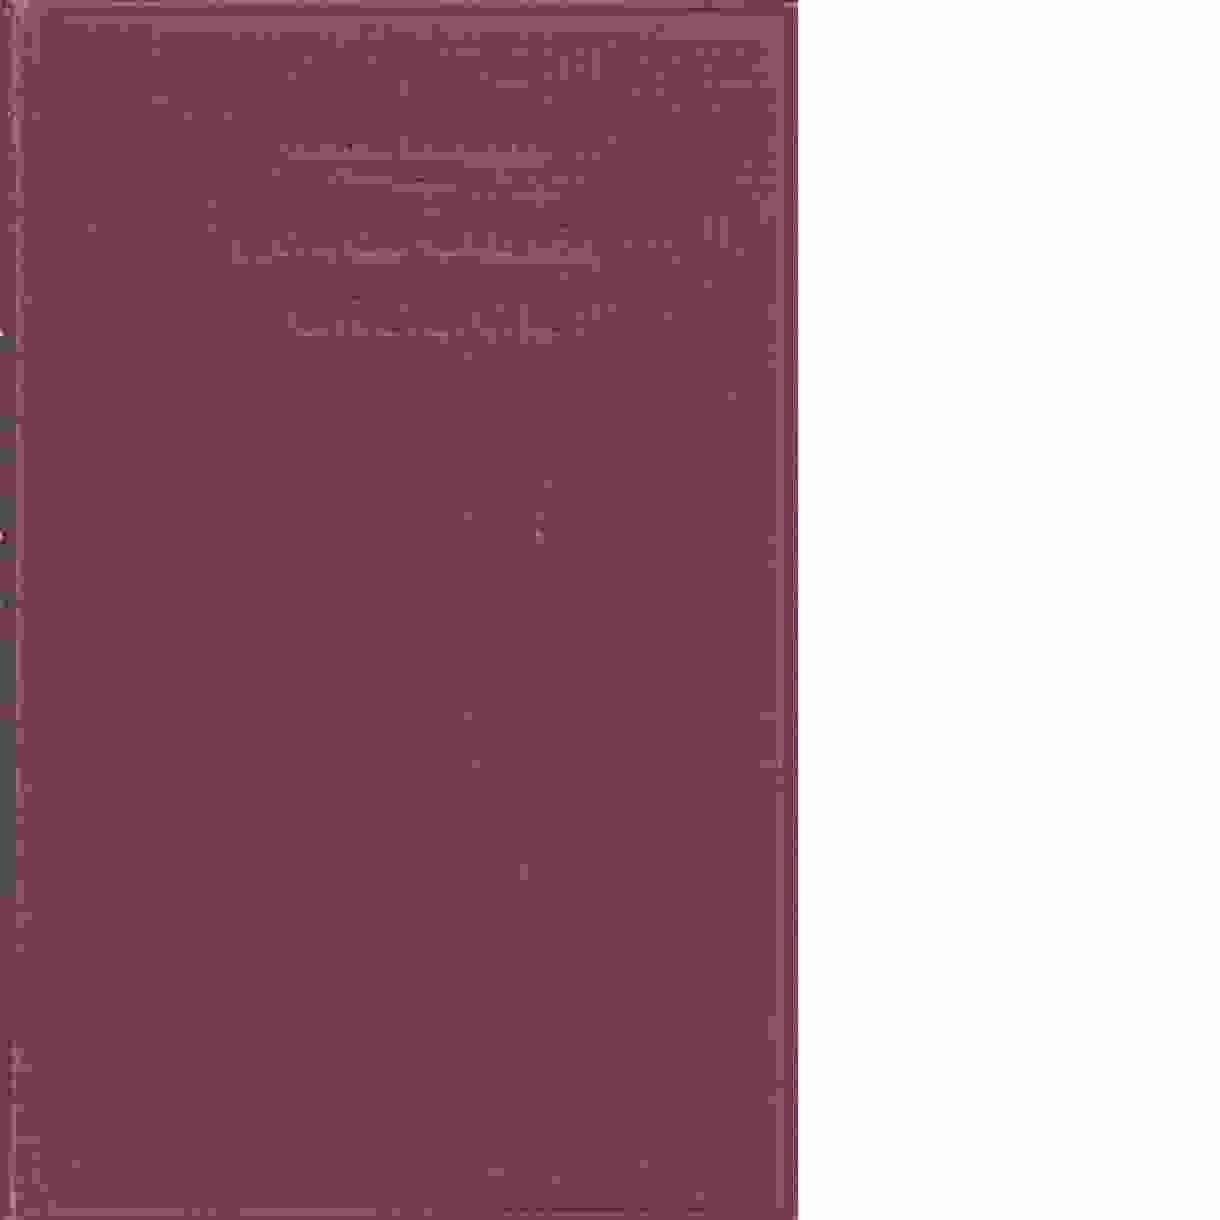 Latinsk-svensk ordbok - Salenius A. G. G.